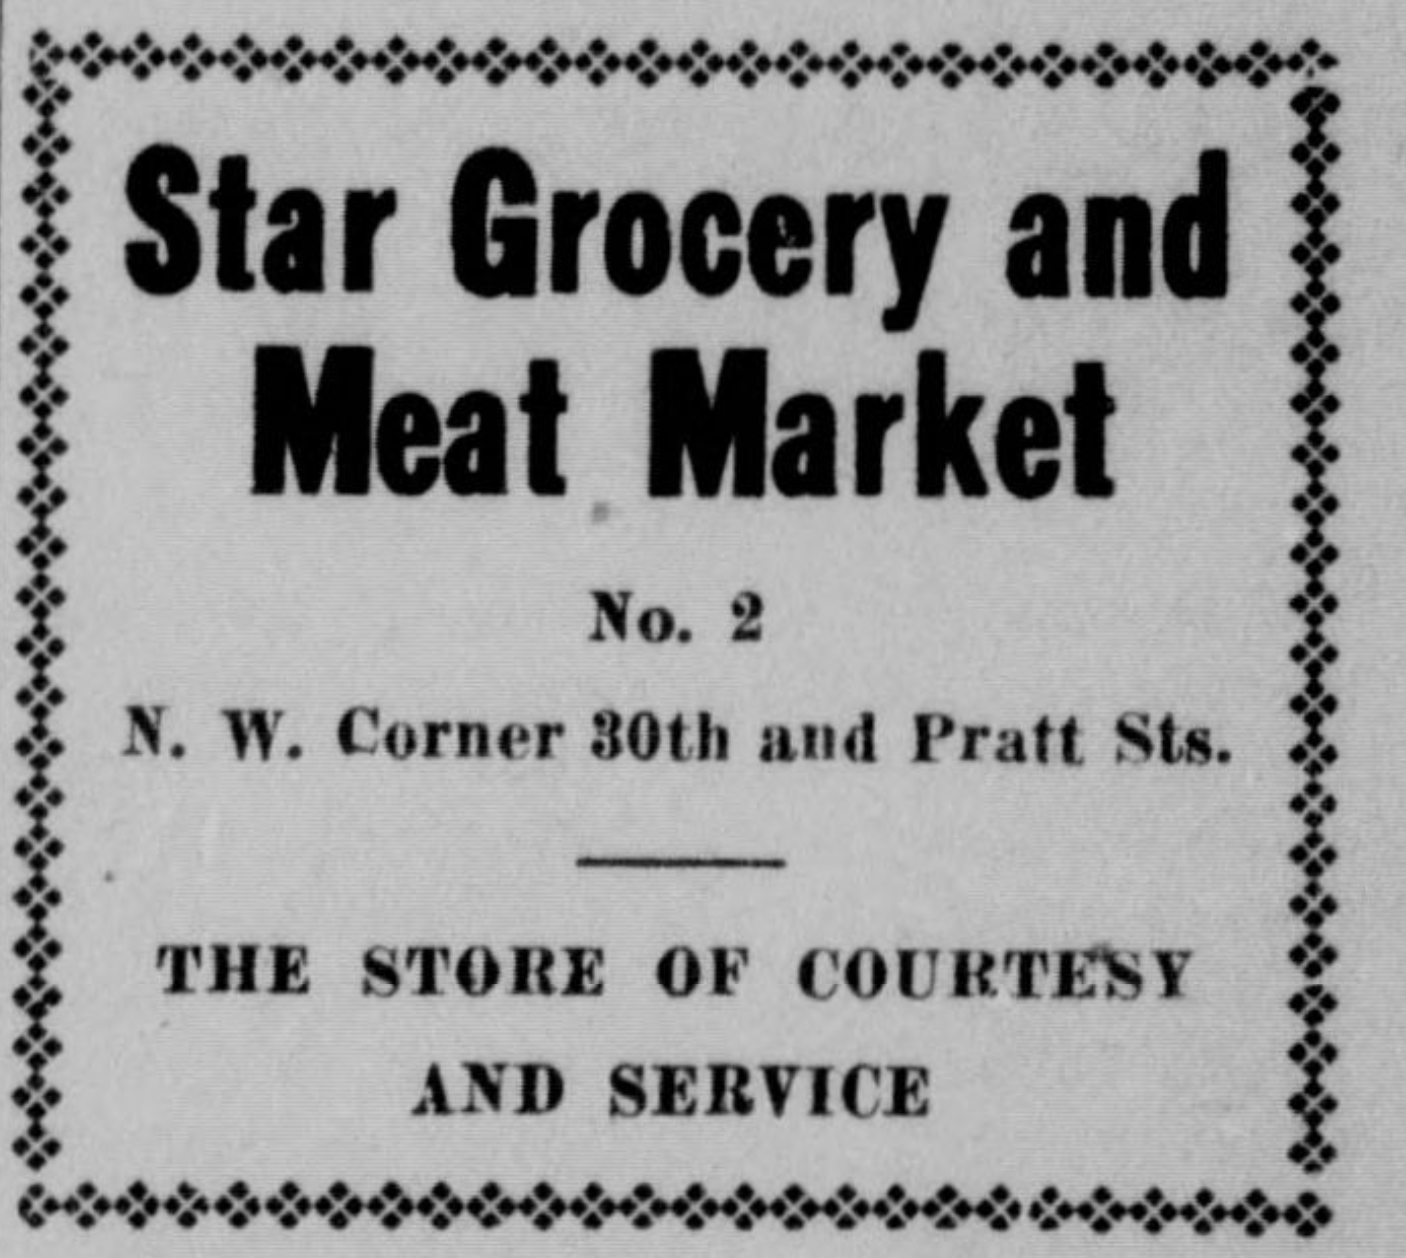 Star Grocery and Meat Market, North 30th and Pratt Street, North Omaha, Nebraska